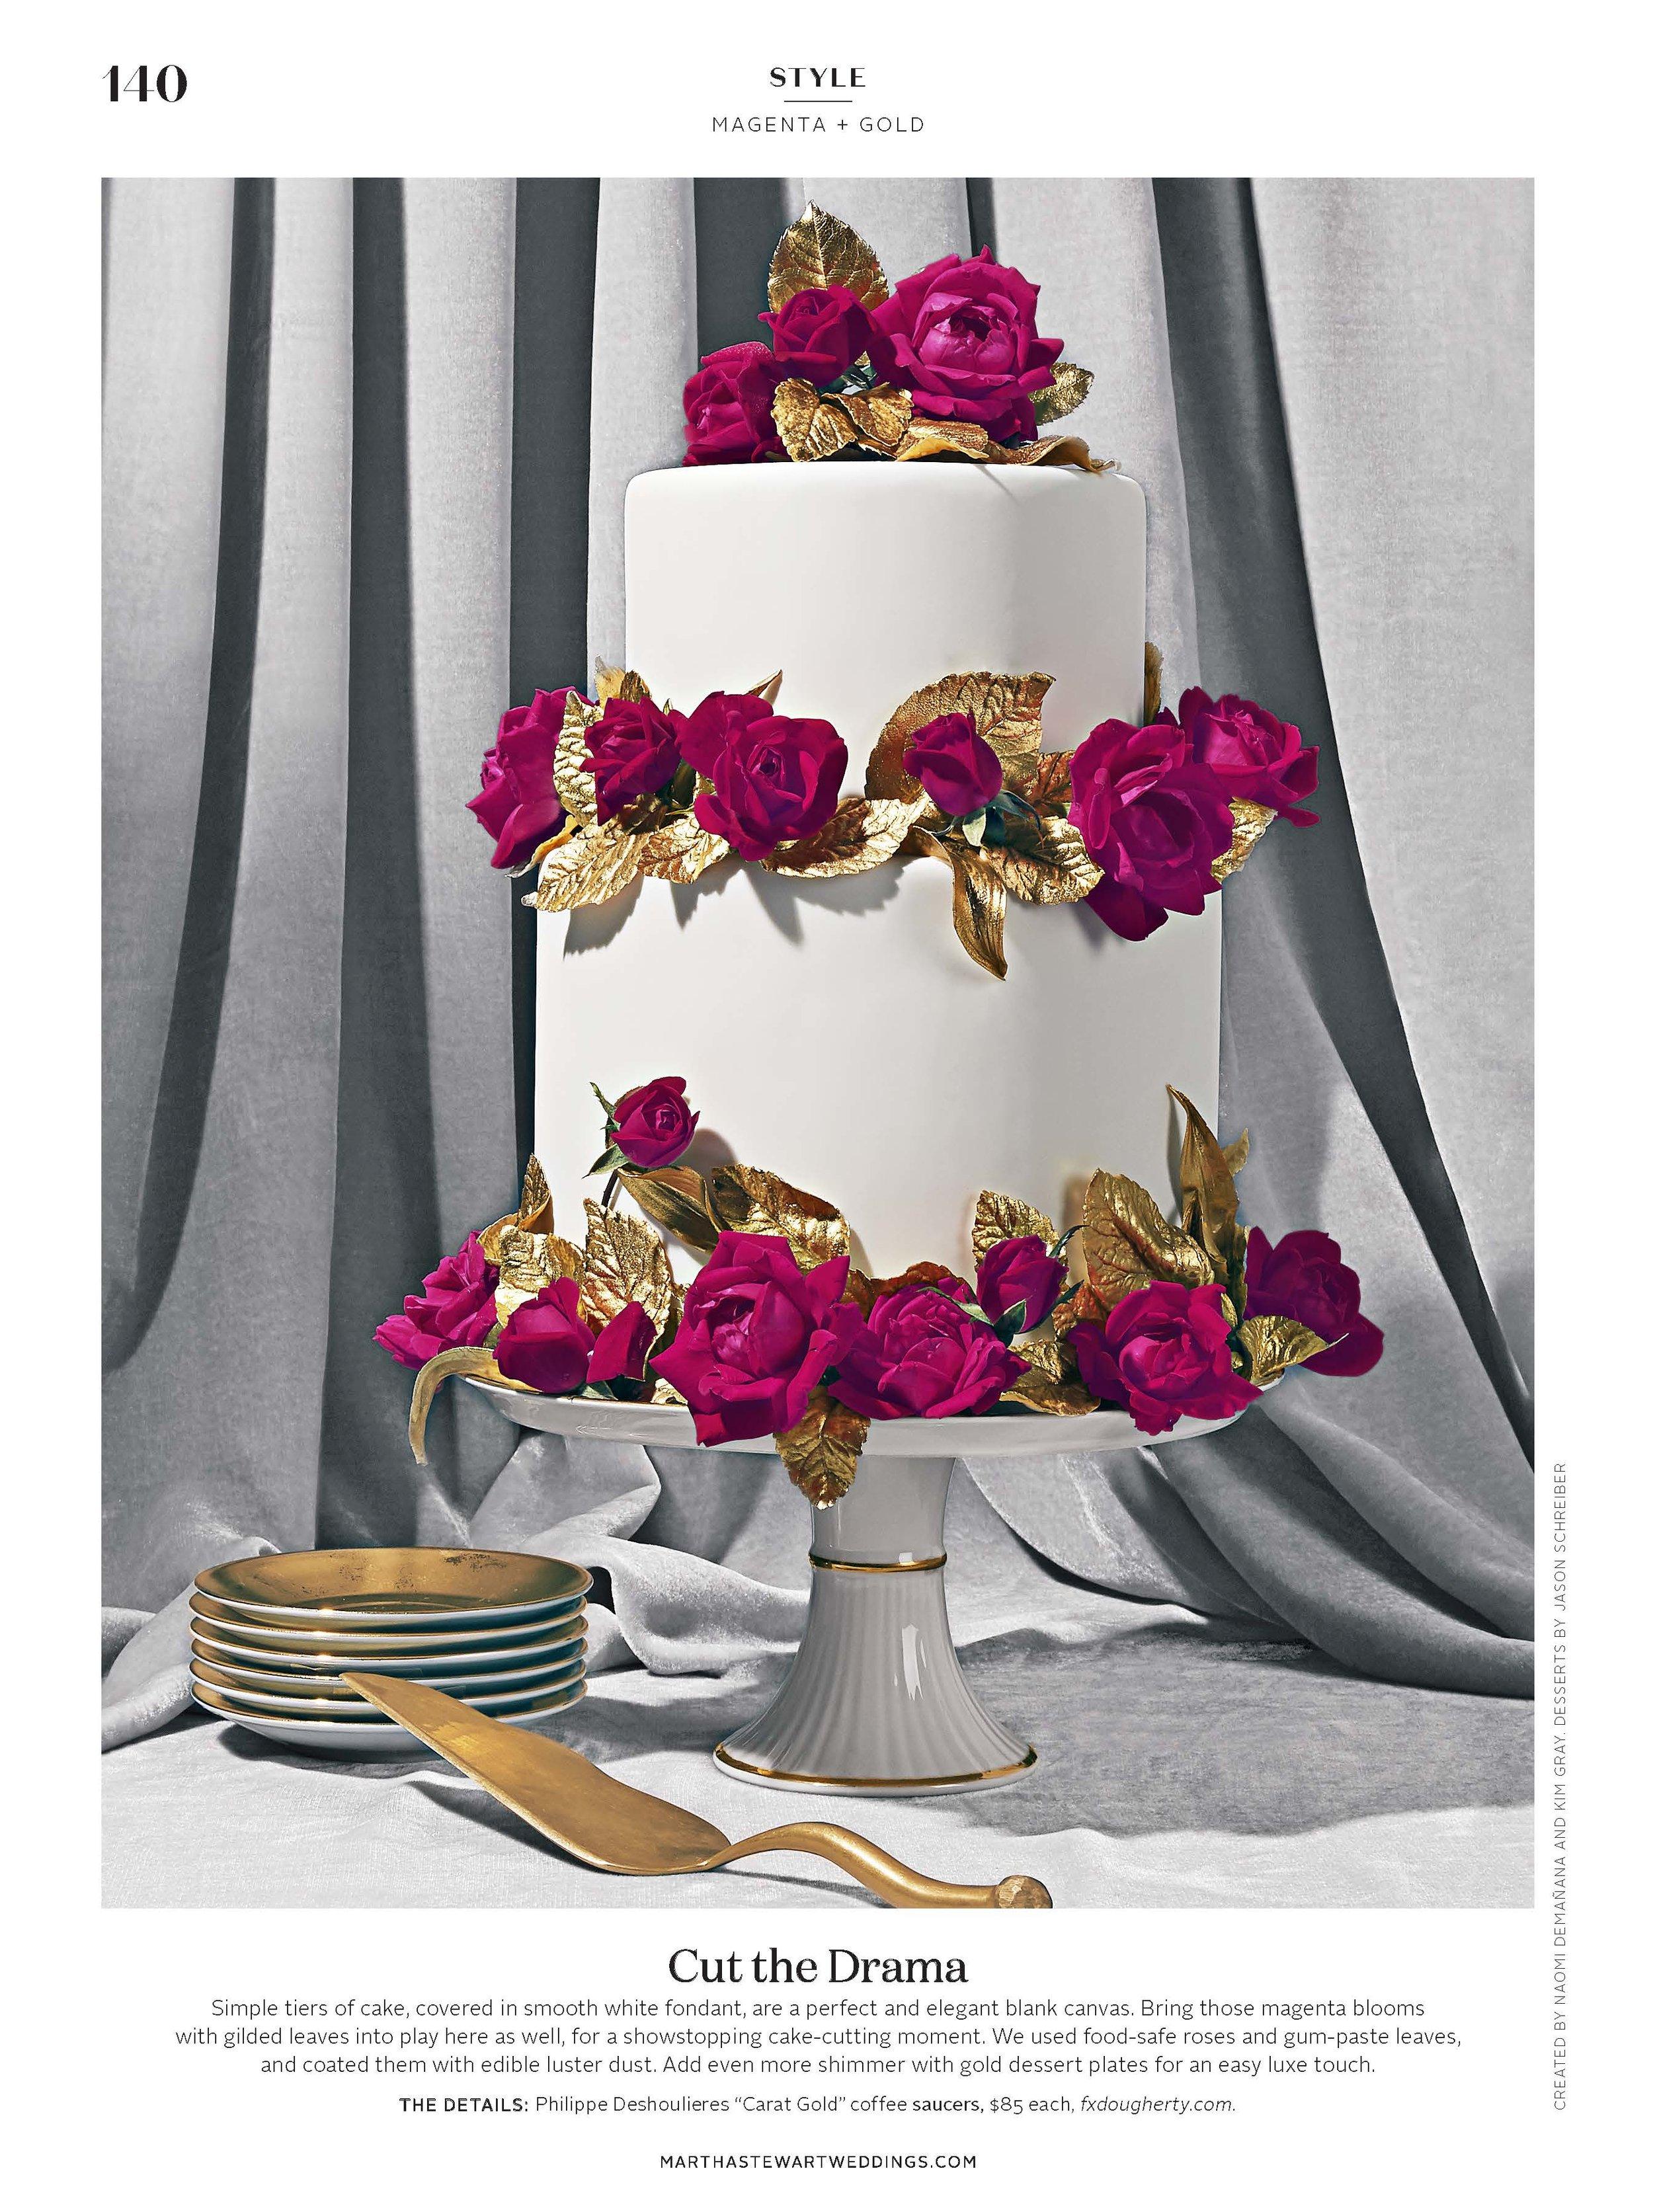 Magenta and Gold Cake, Martha Stewart Weddings